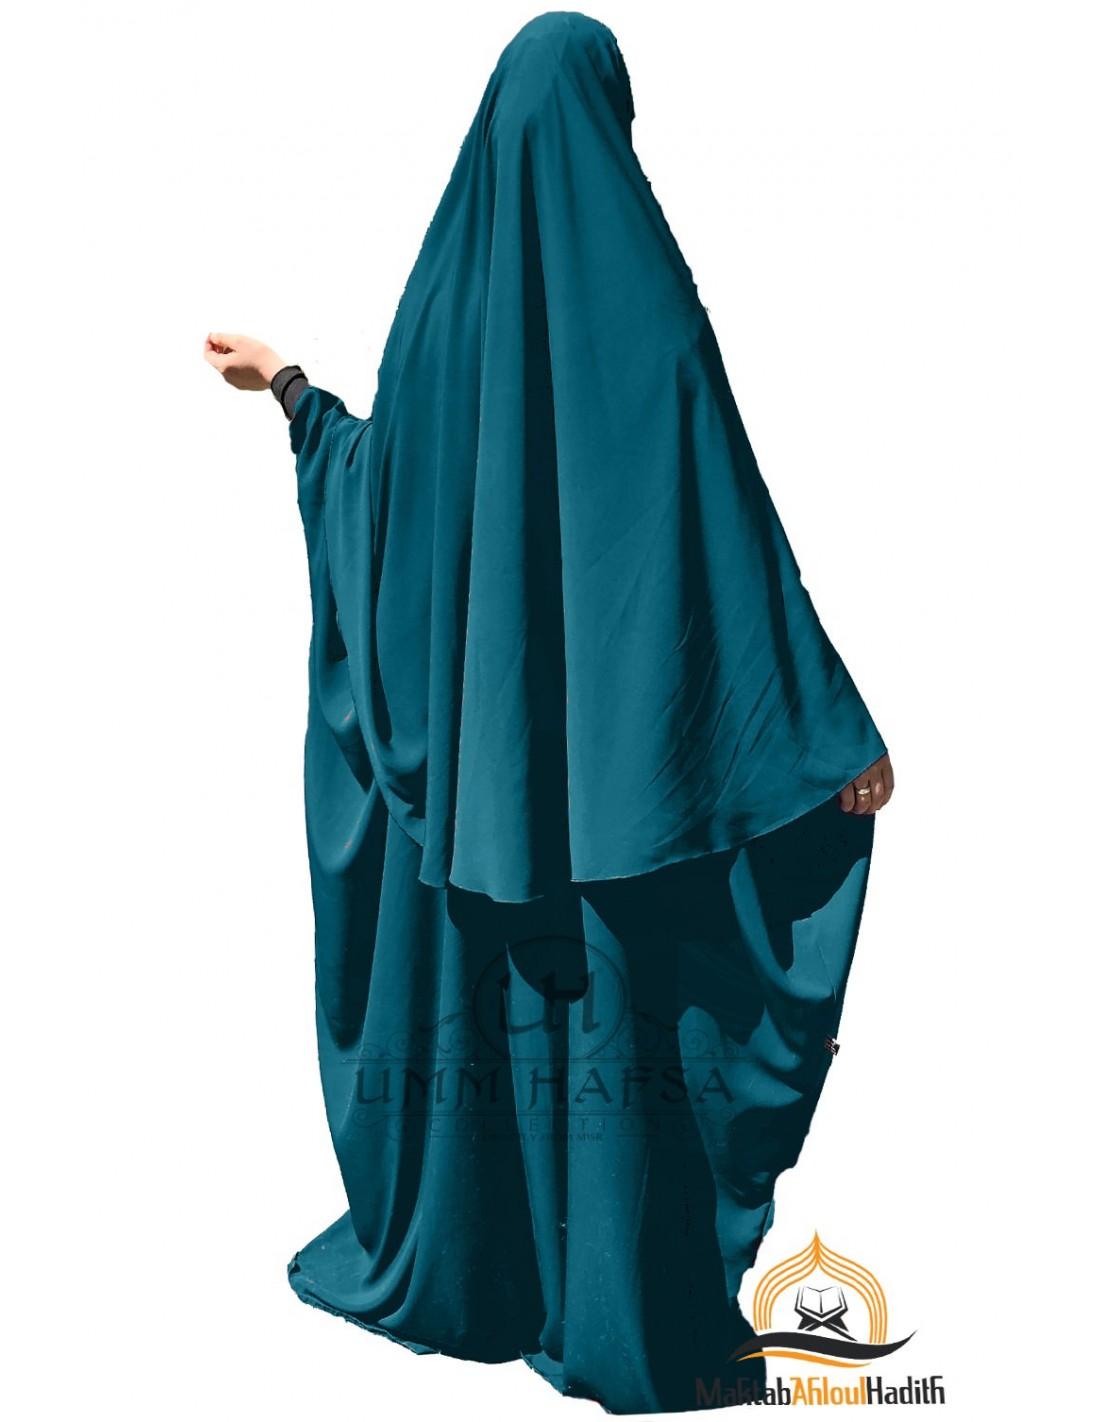 Butterfly abaya /Hijab Maryam Green by Umm Hafsa Collection